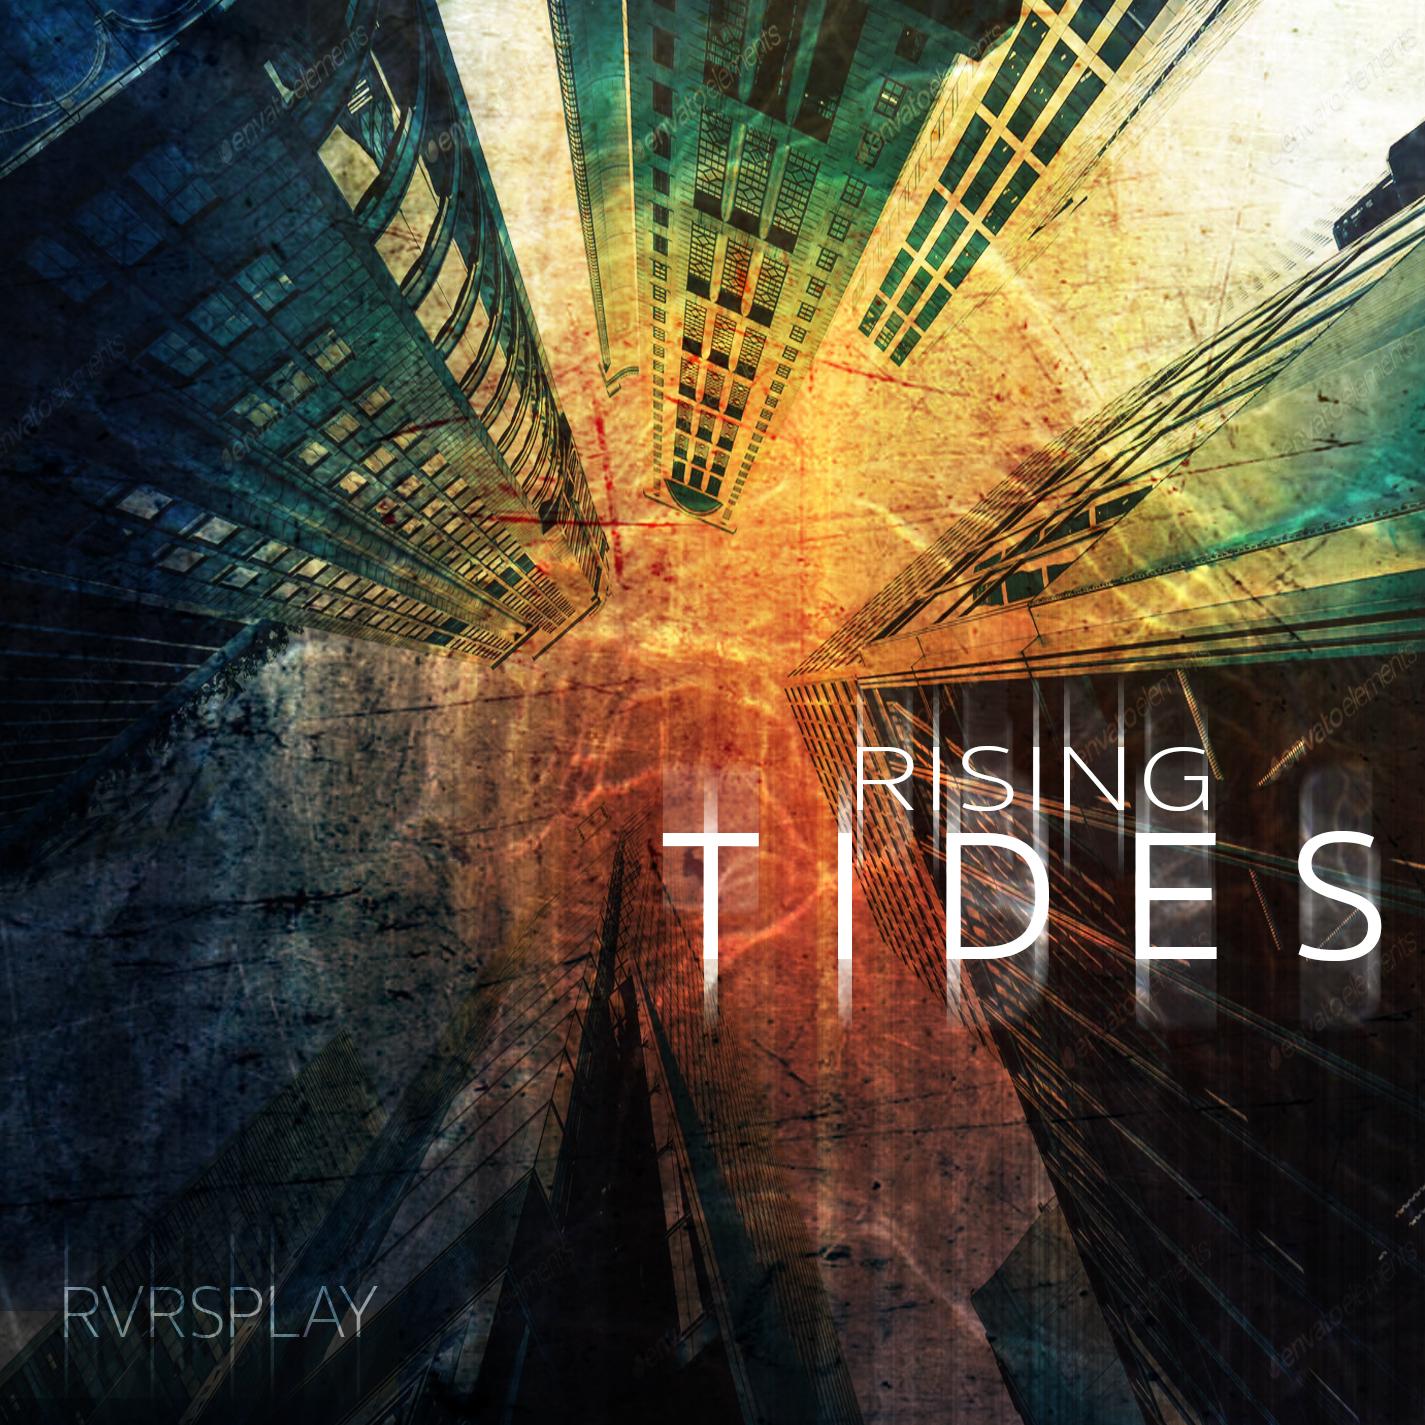 RVP_Rising Tides_Album Cover.jpg